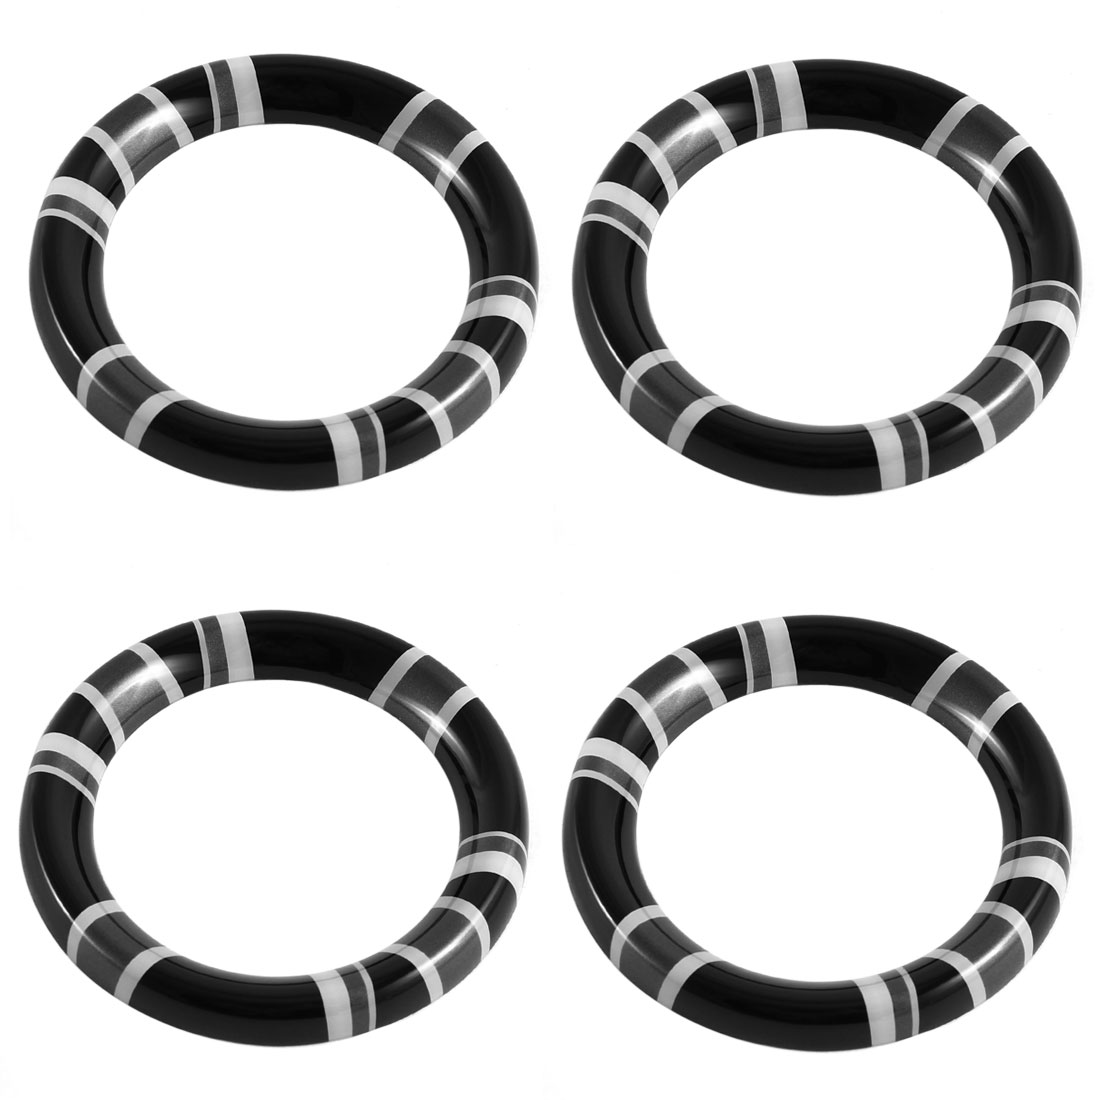 4pcs Black Gray Plastic Adhesive Car Door Handle Cover Ring for BMW Mini R60